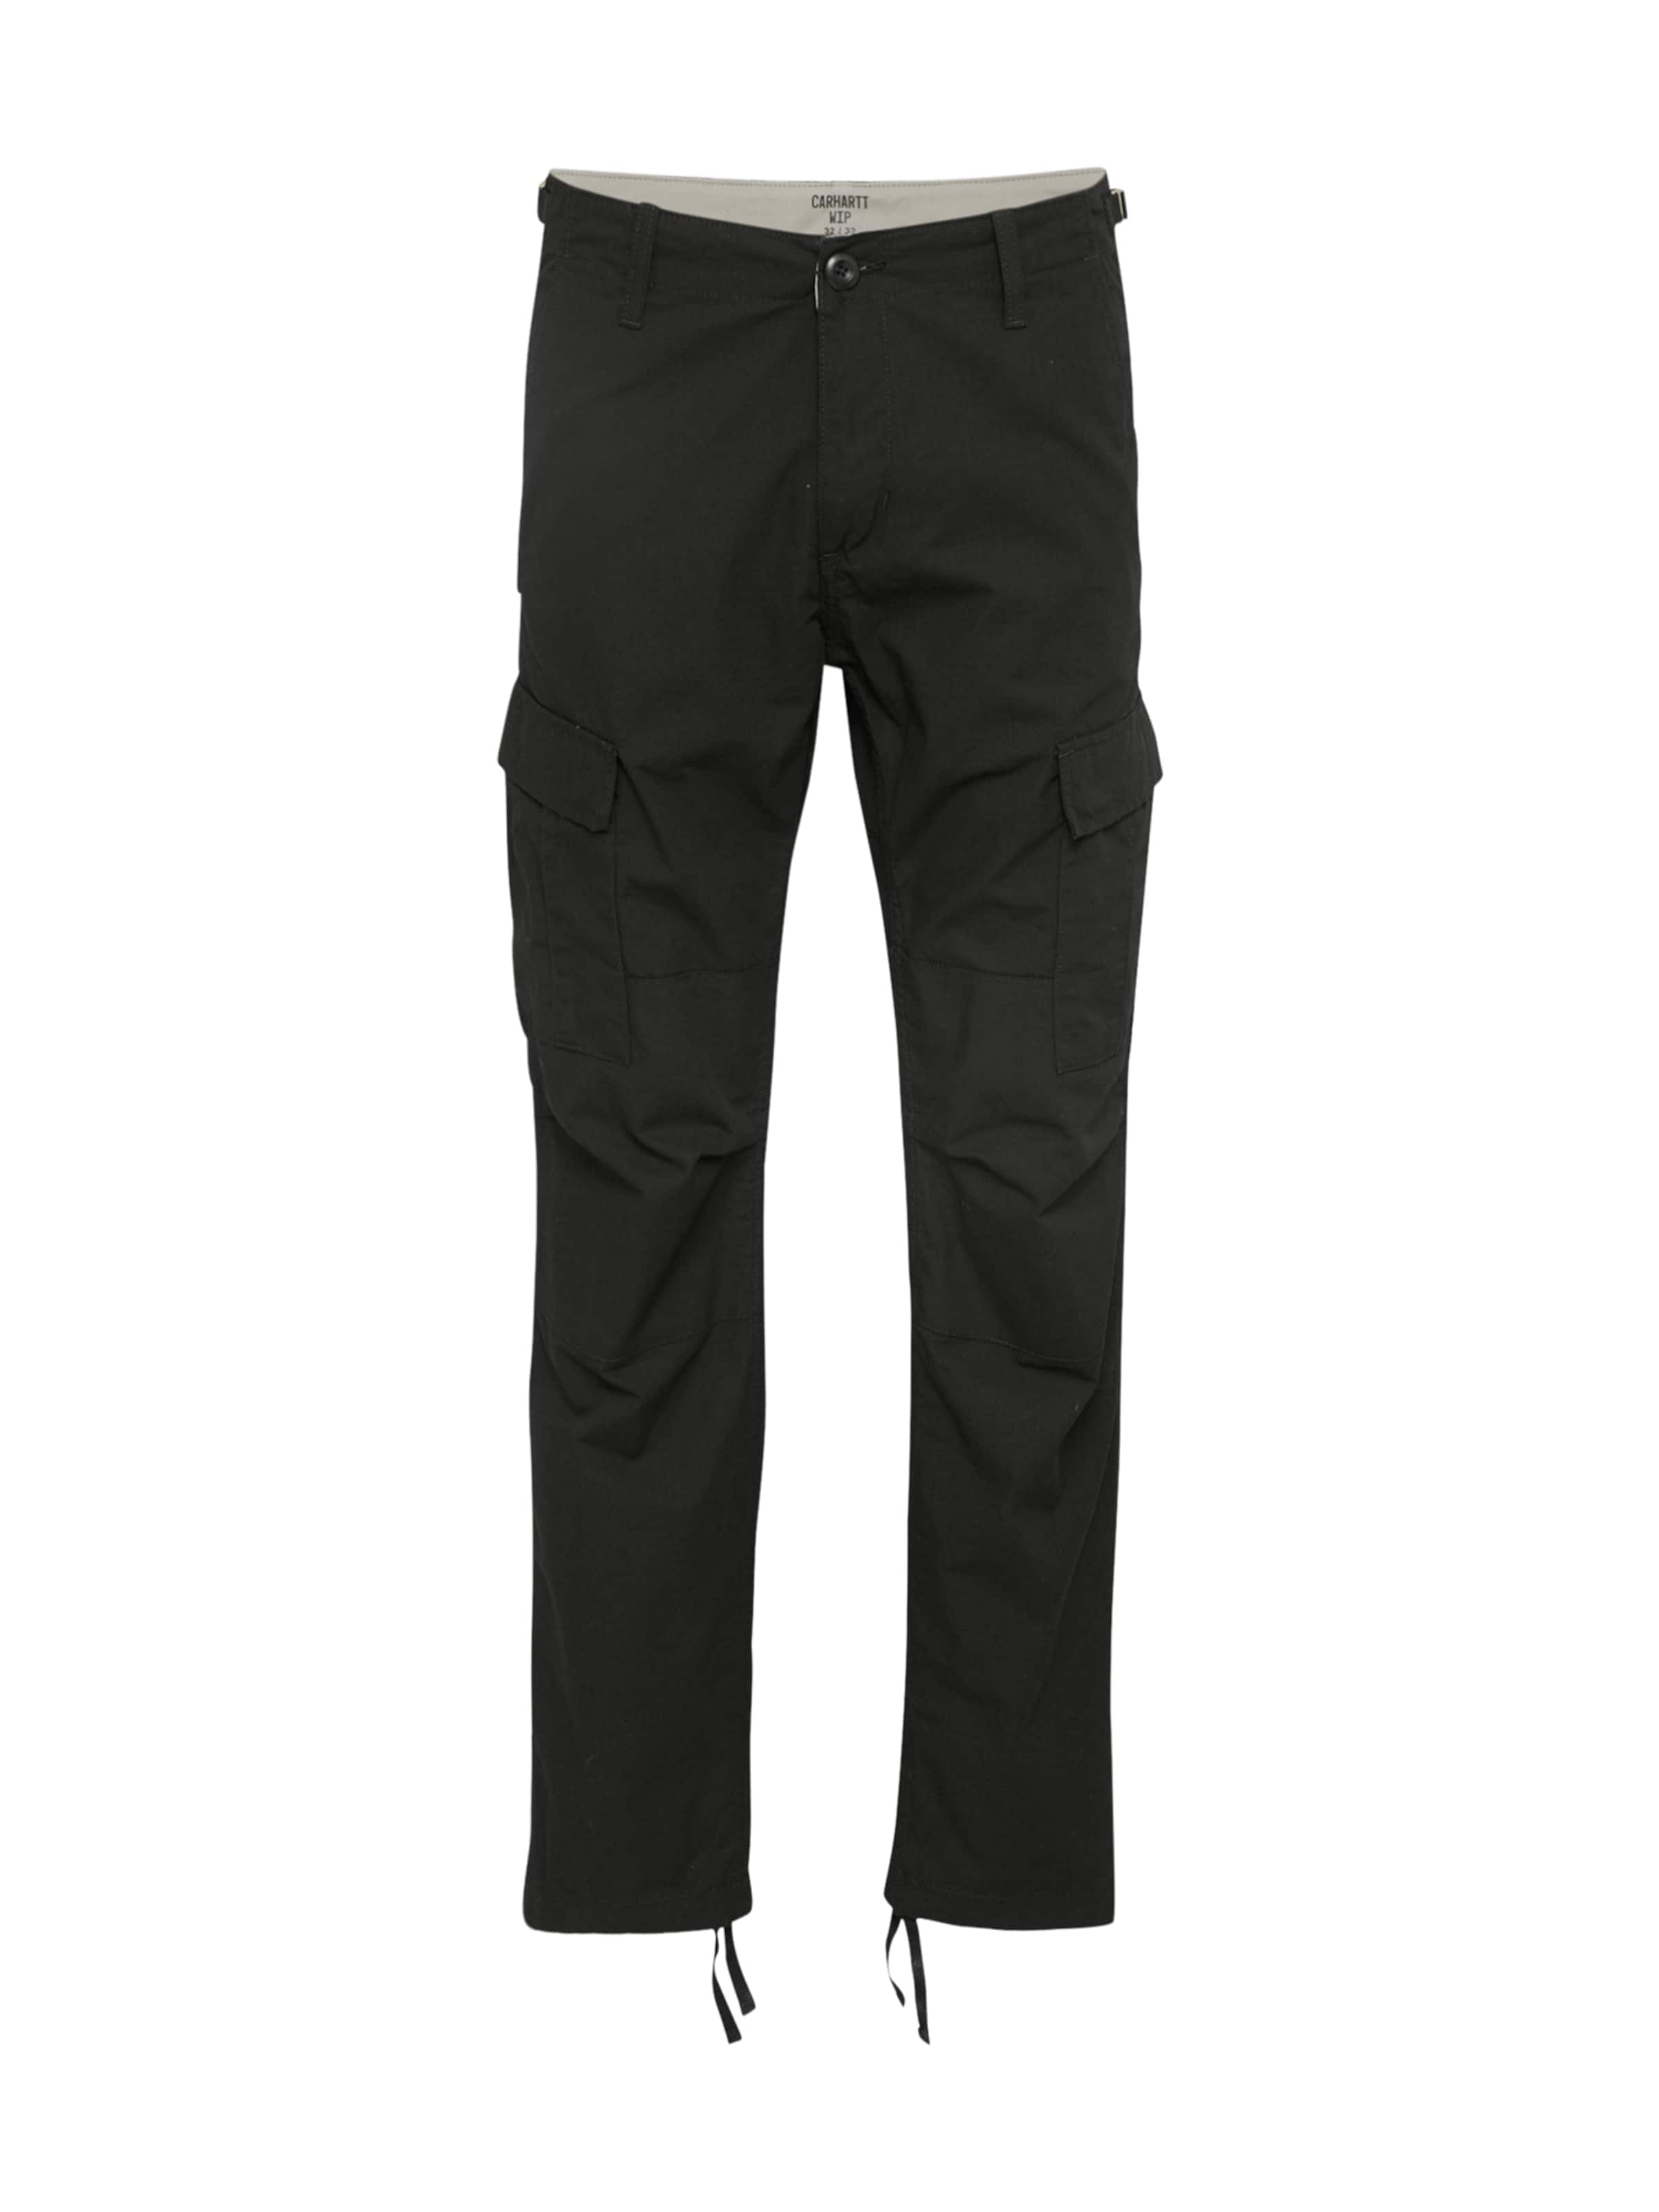 Pant' Wip Carhartt Cargo 'aviation En Pantalon Noir 0Pkw8nO